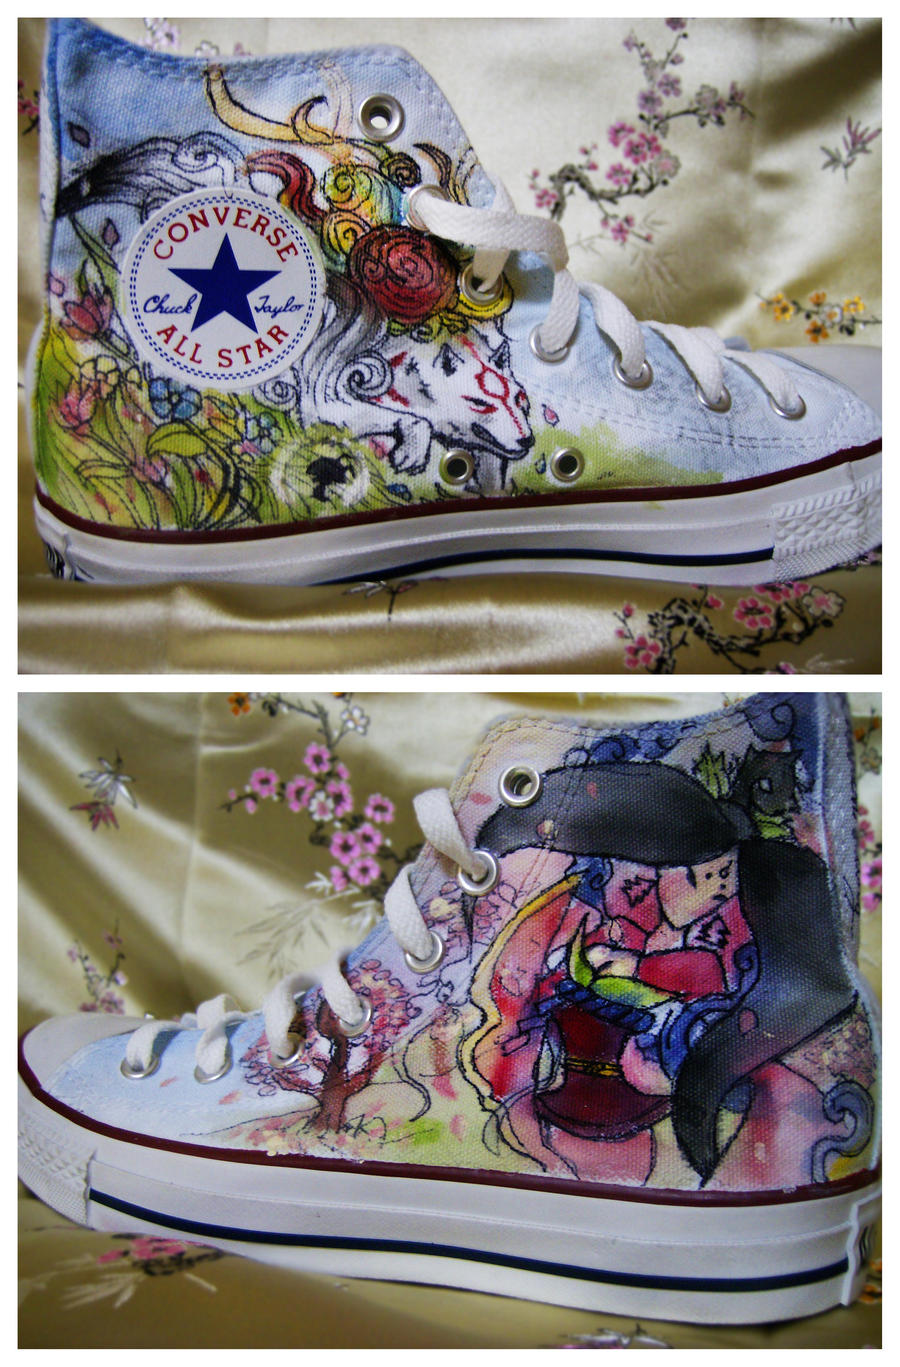 Okami Shoes 2 by pinkbutterflyofdeath